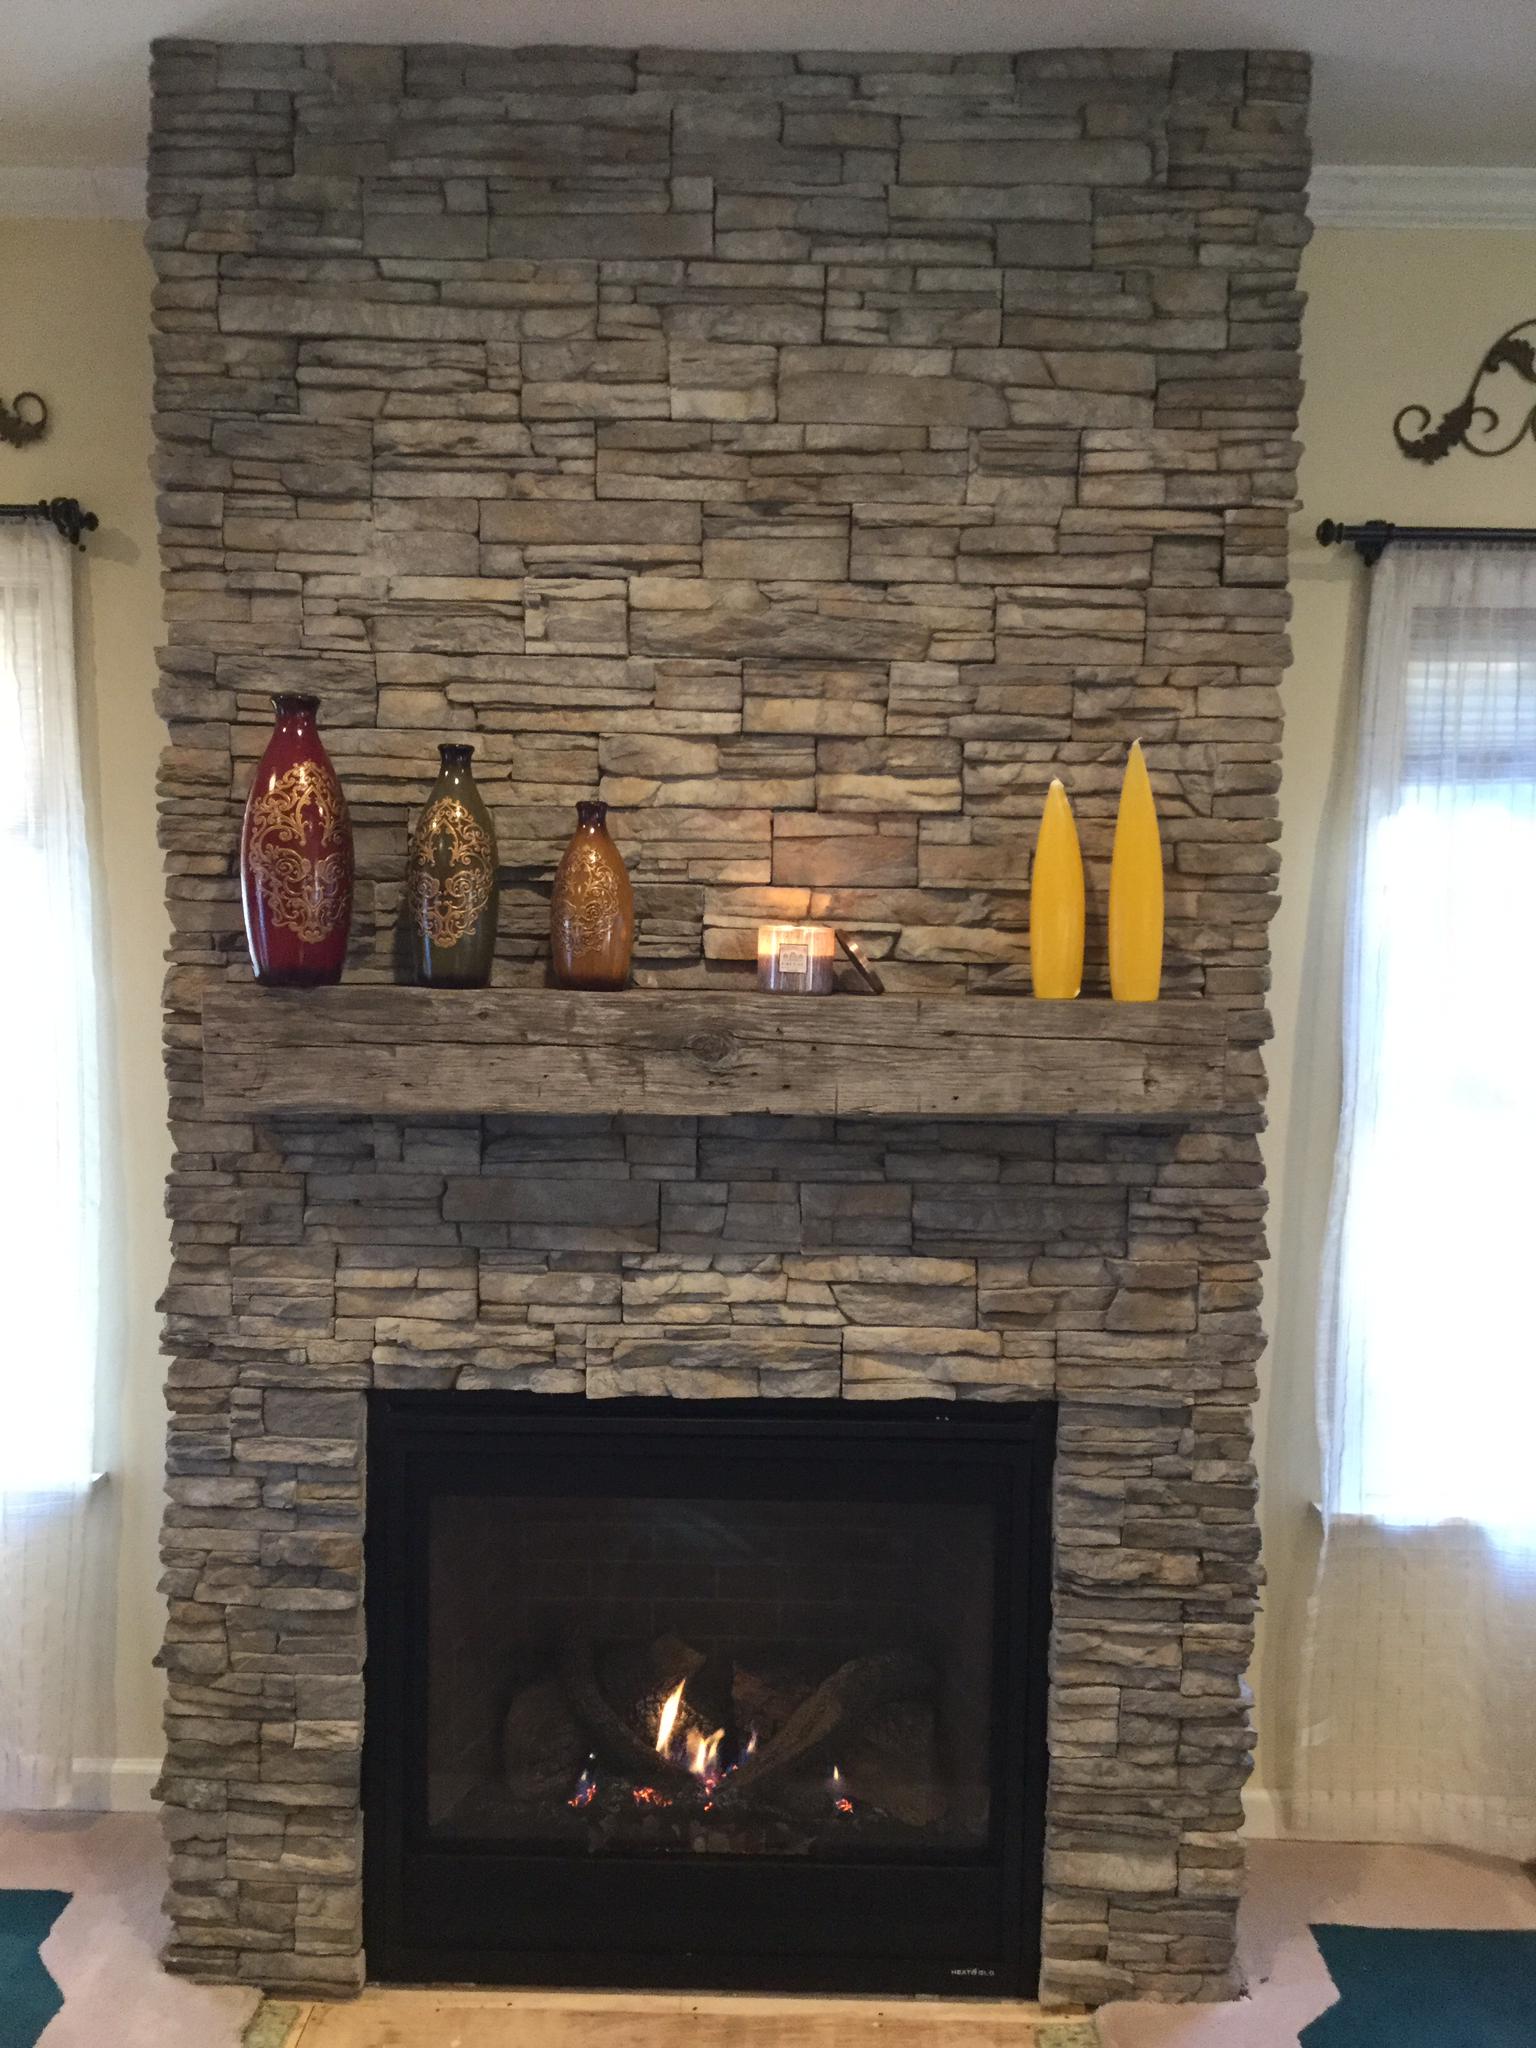 Eldorado Stone Nantucket Great Product Looks Awesome Stacked Stone Fireplaces Eldorado Stone Fireplace Tv Wall